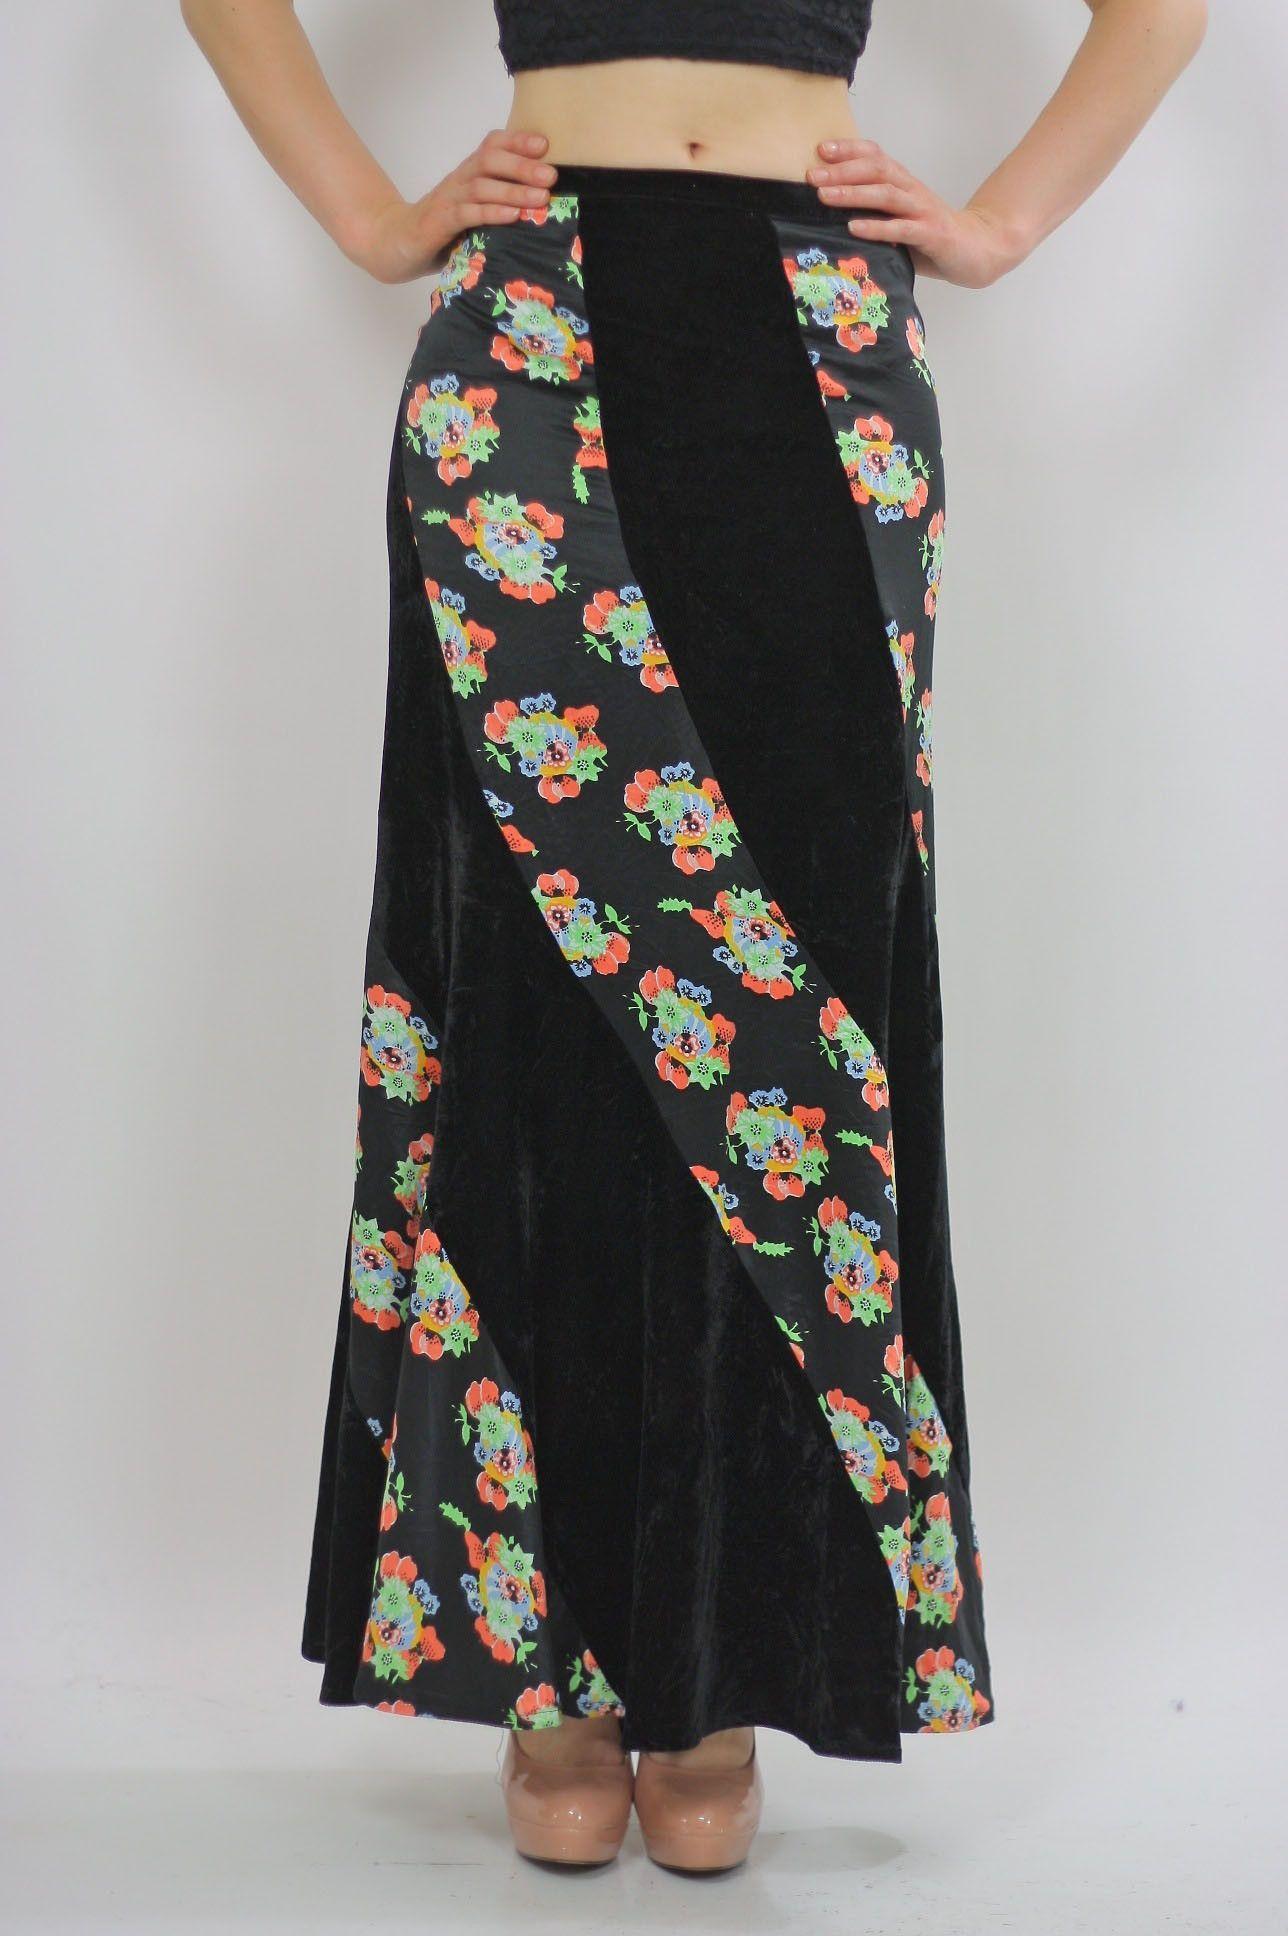 ddc87aca65 Grunge maxi skirt Content: Rayon stretch velvet, polyester Color: Black  velvet, Floral